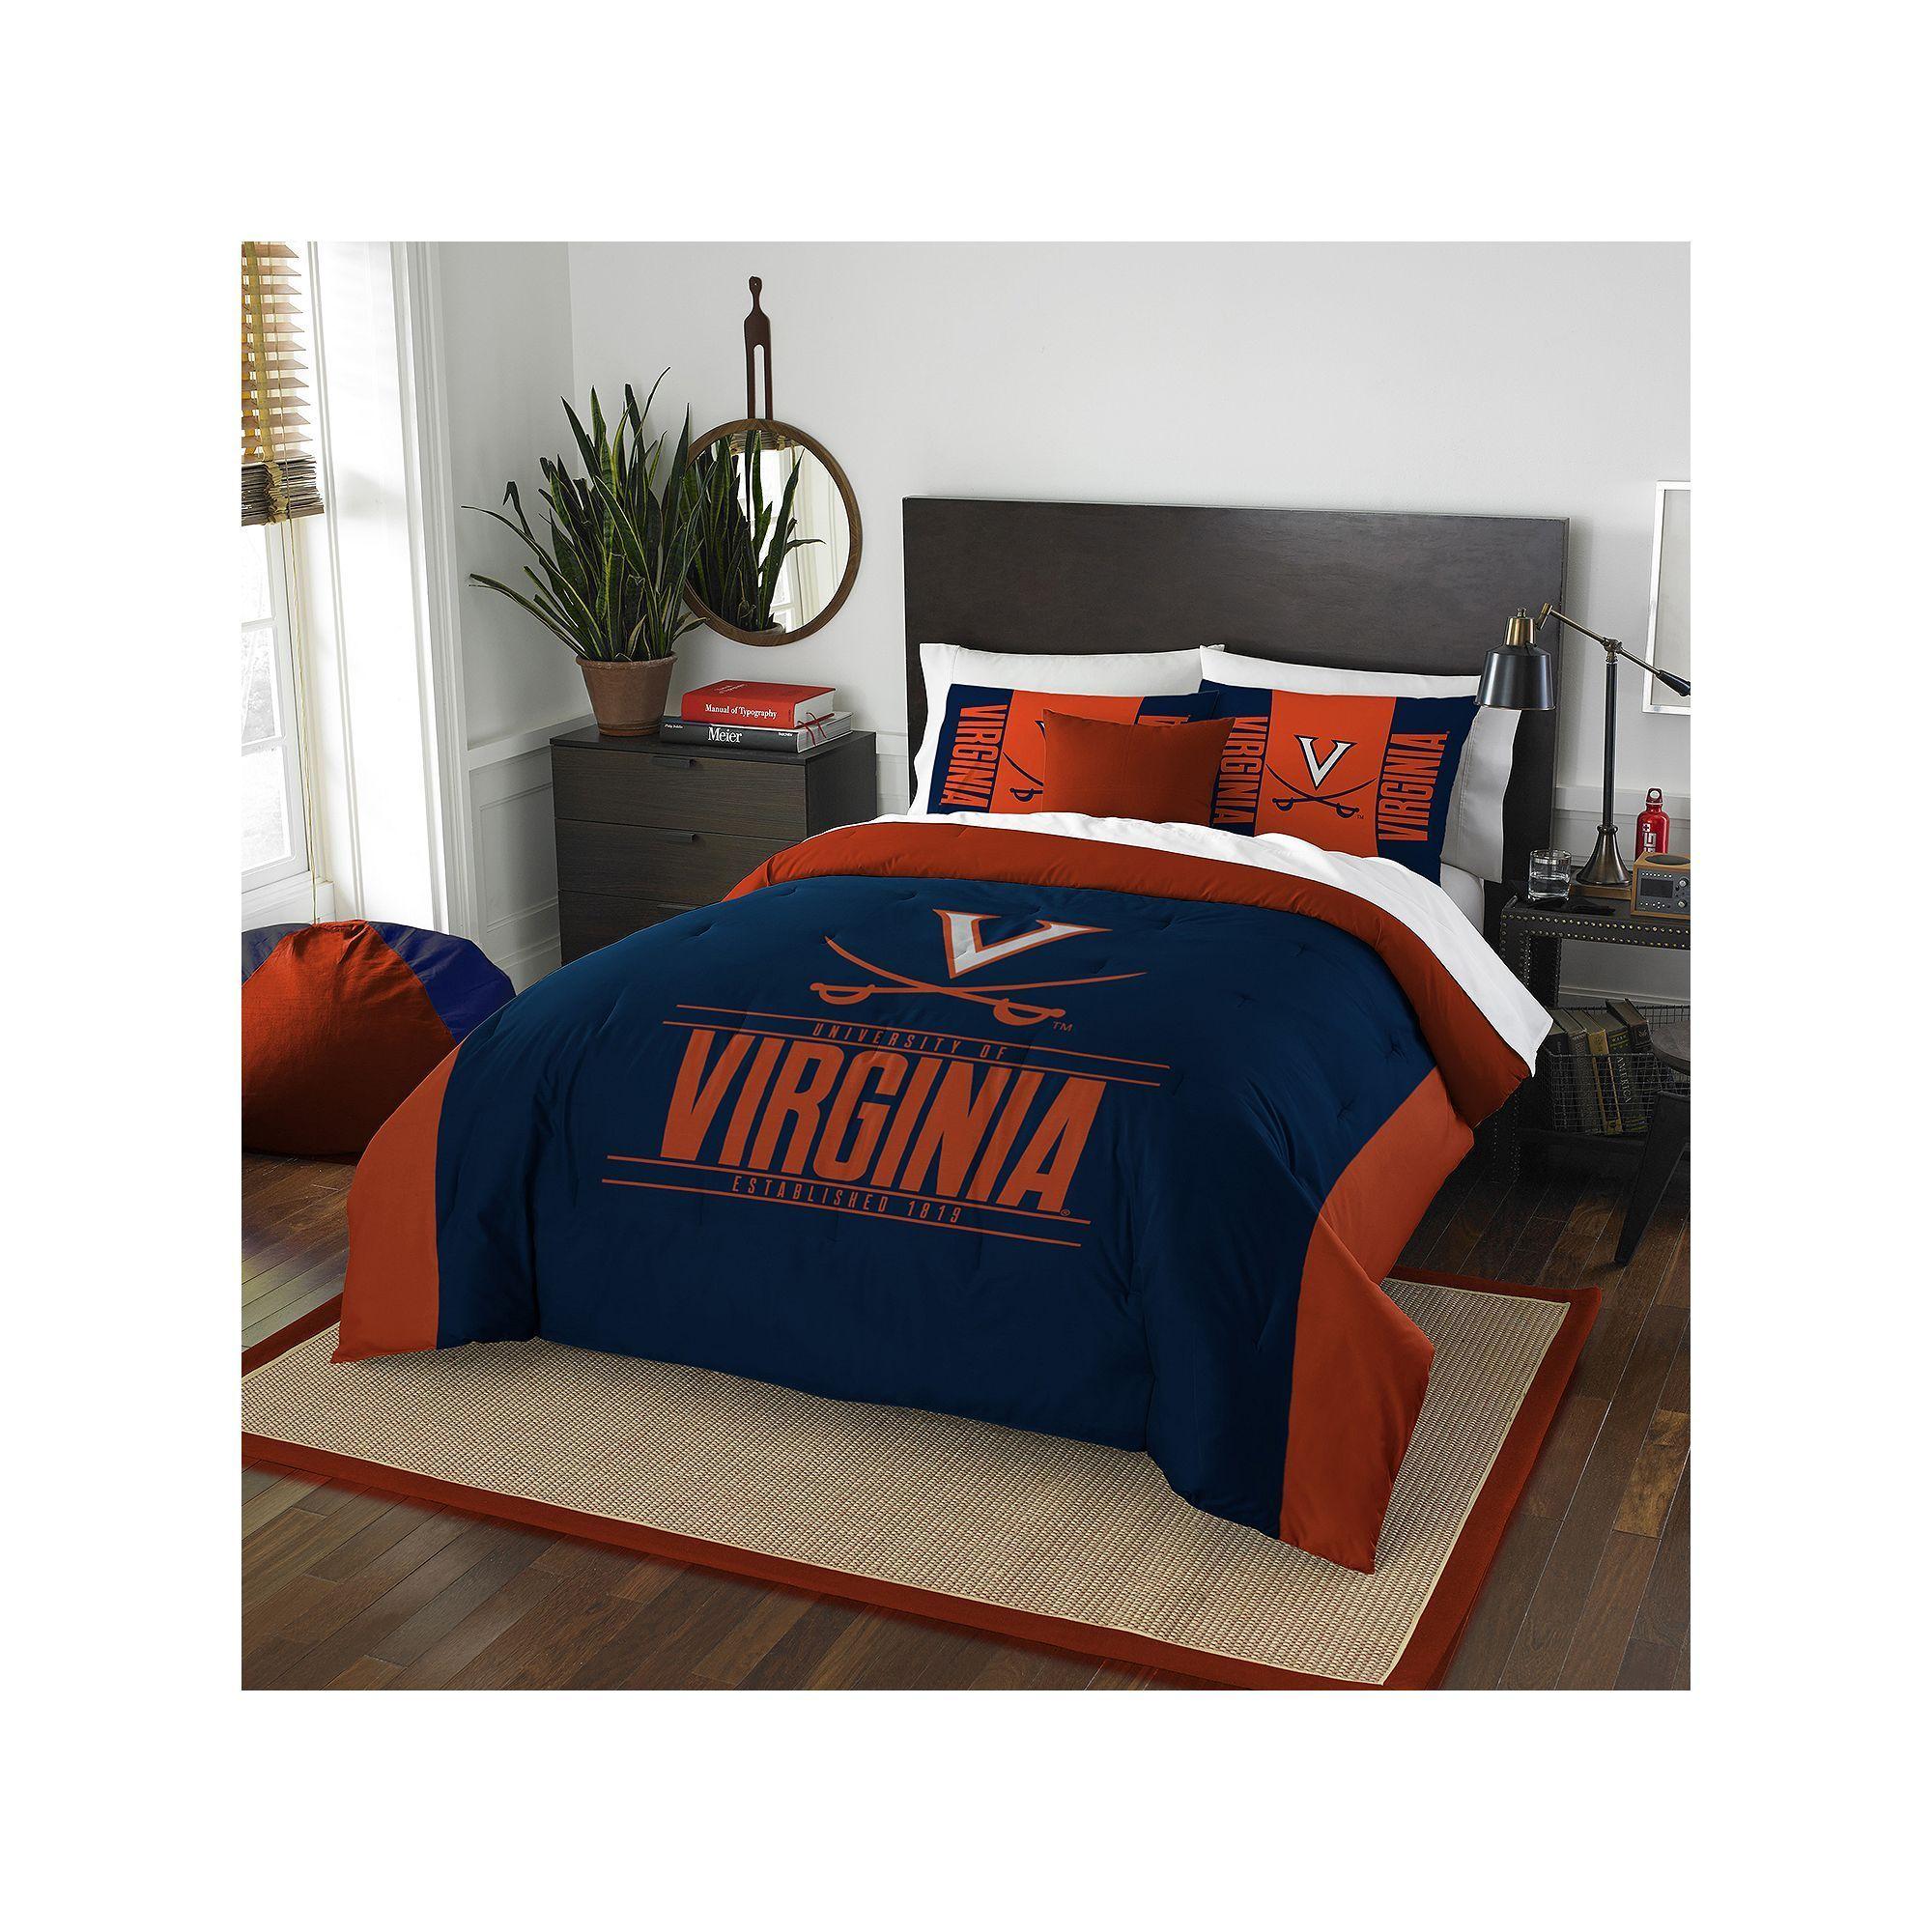 Comforters Sets 3pc Chicago Bears Twin Full Comforter Set Logo Orange Shams Nfl Football Bedding Home Garden Ohioeyecareconsultants Com